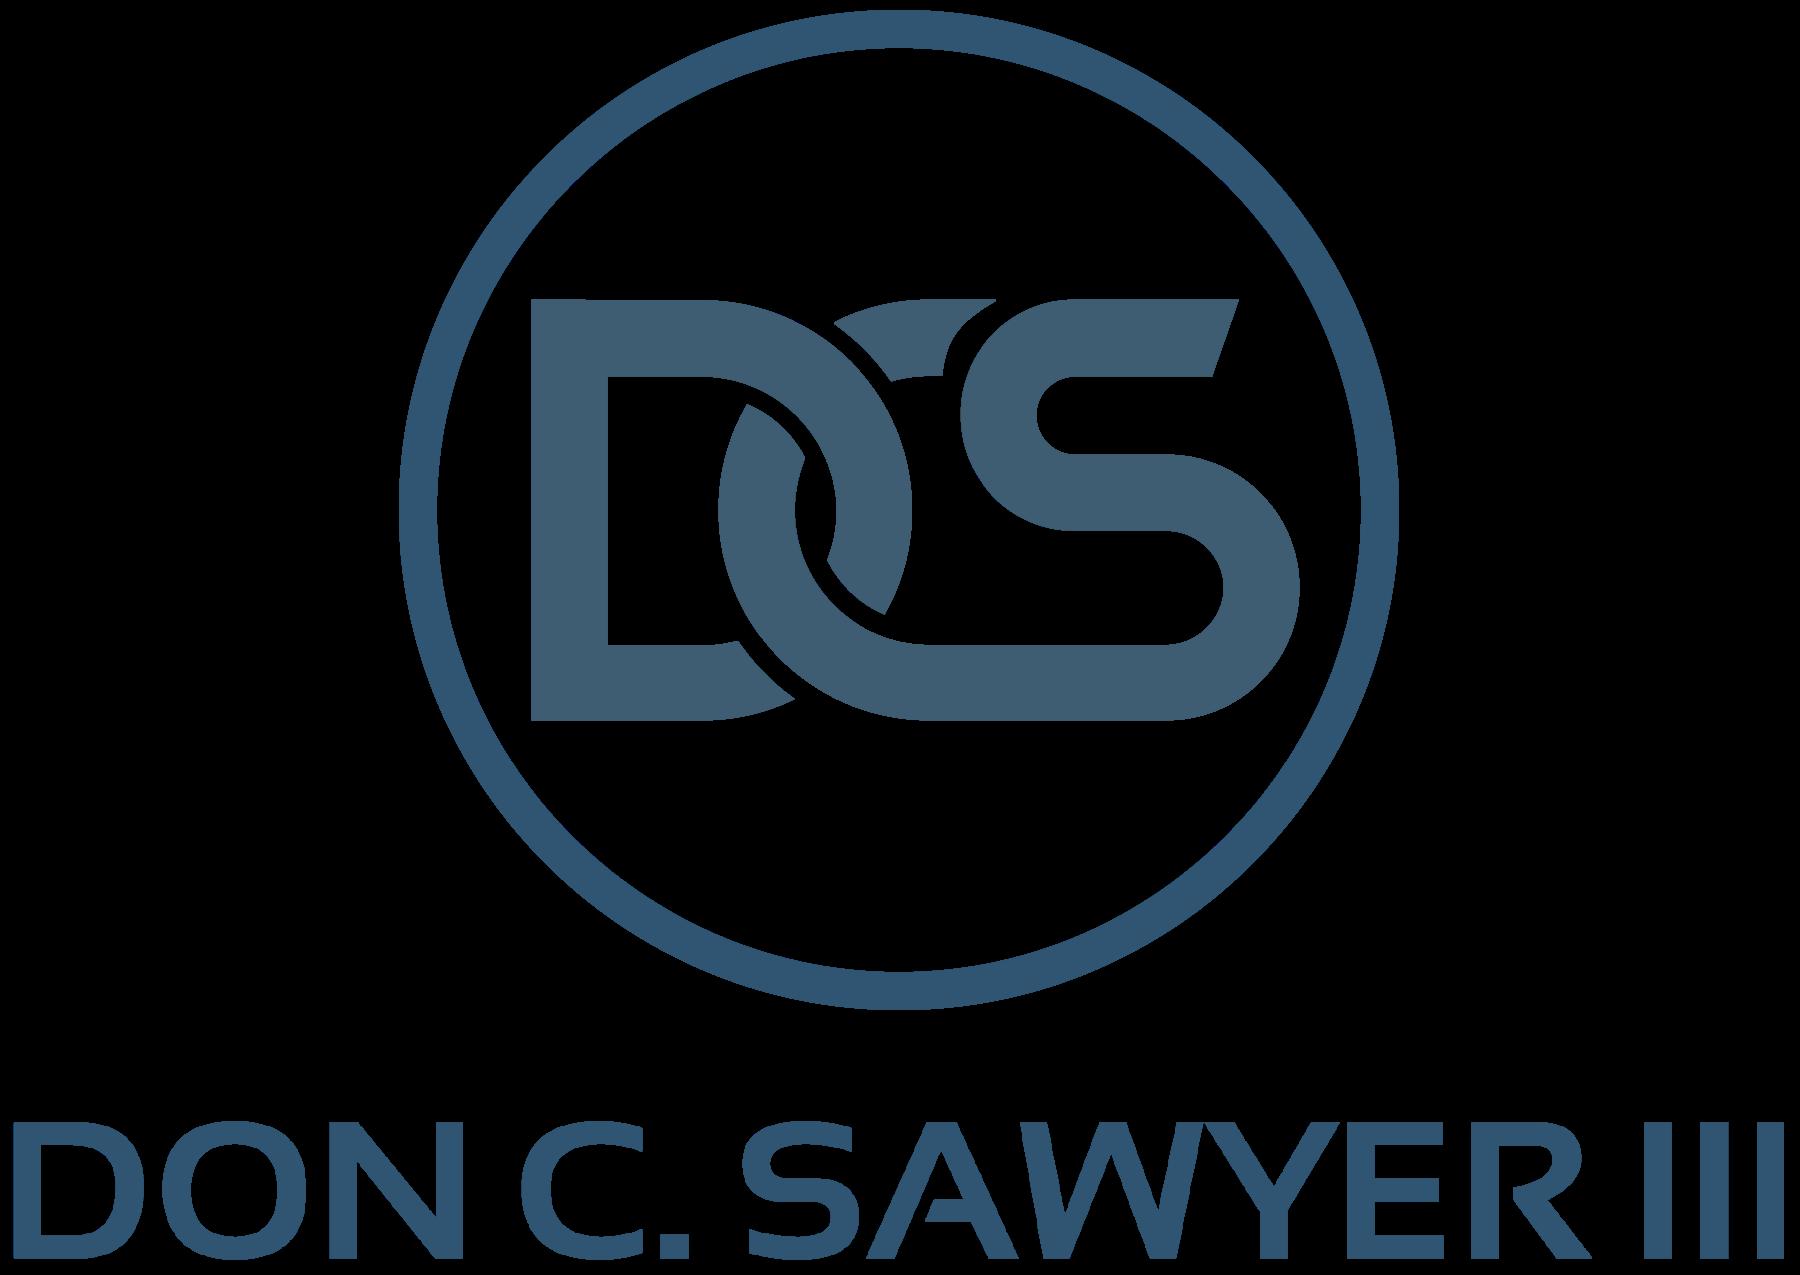 Don C. Sawyer III, Ph.D.